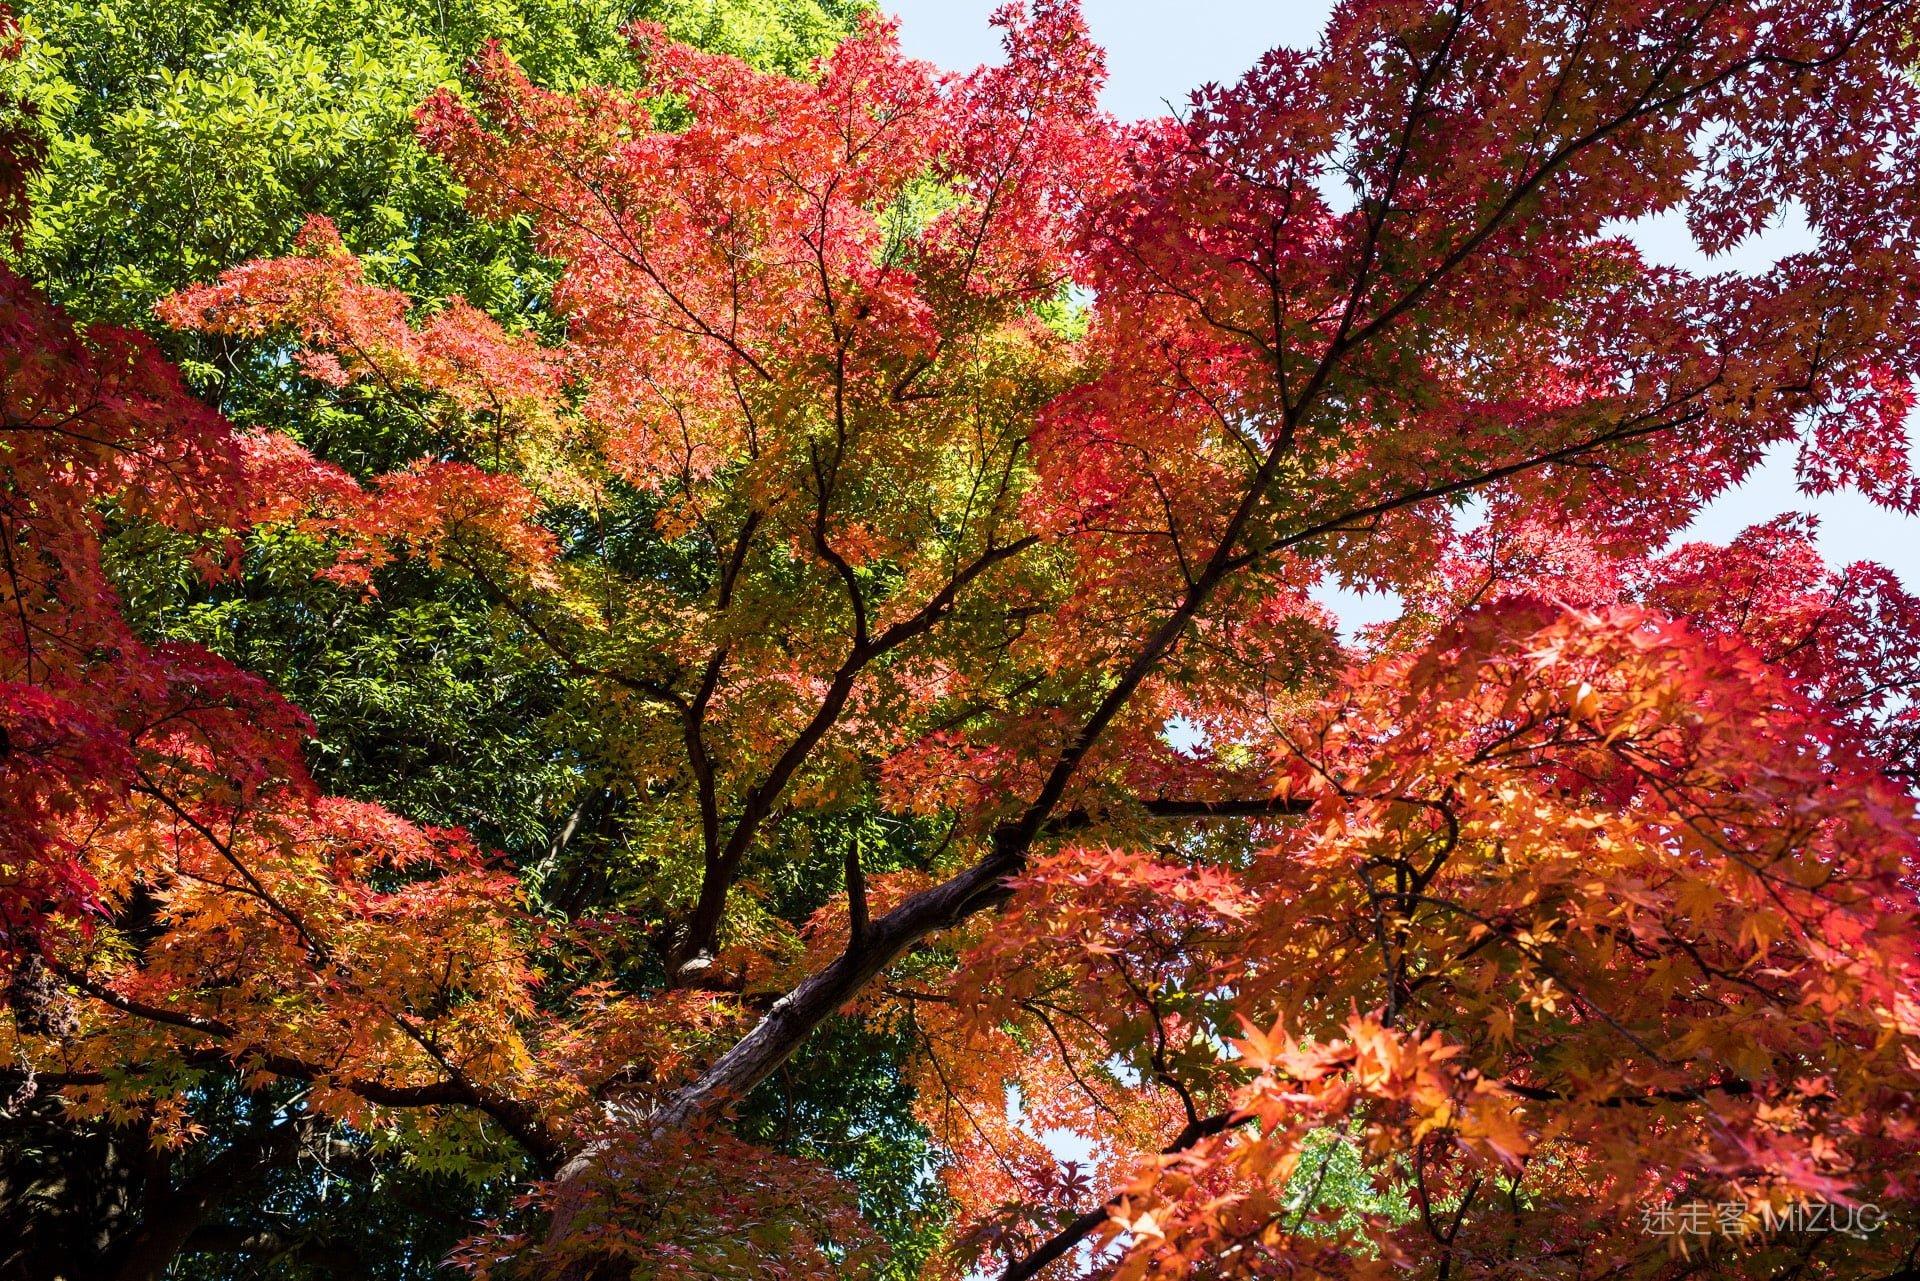 201711 Ibaraki Tochigi Gunma Japan Travel By RentalCar 85 日本自駕旅遊/北關東三縣「茨城、櫪木、群馬」秋天美食、溫泉與瀑布秘境百景(精選照片分享)